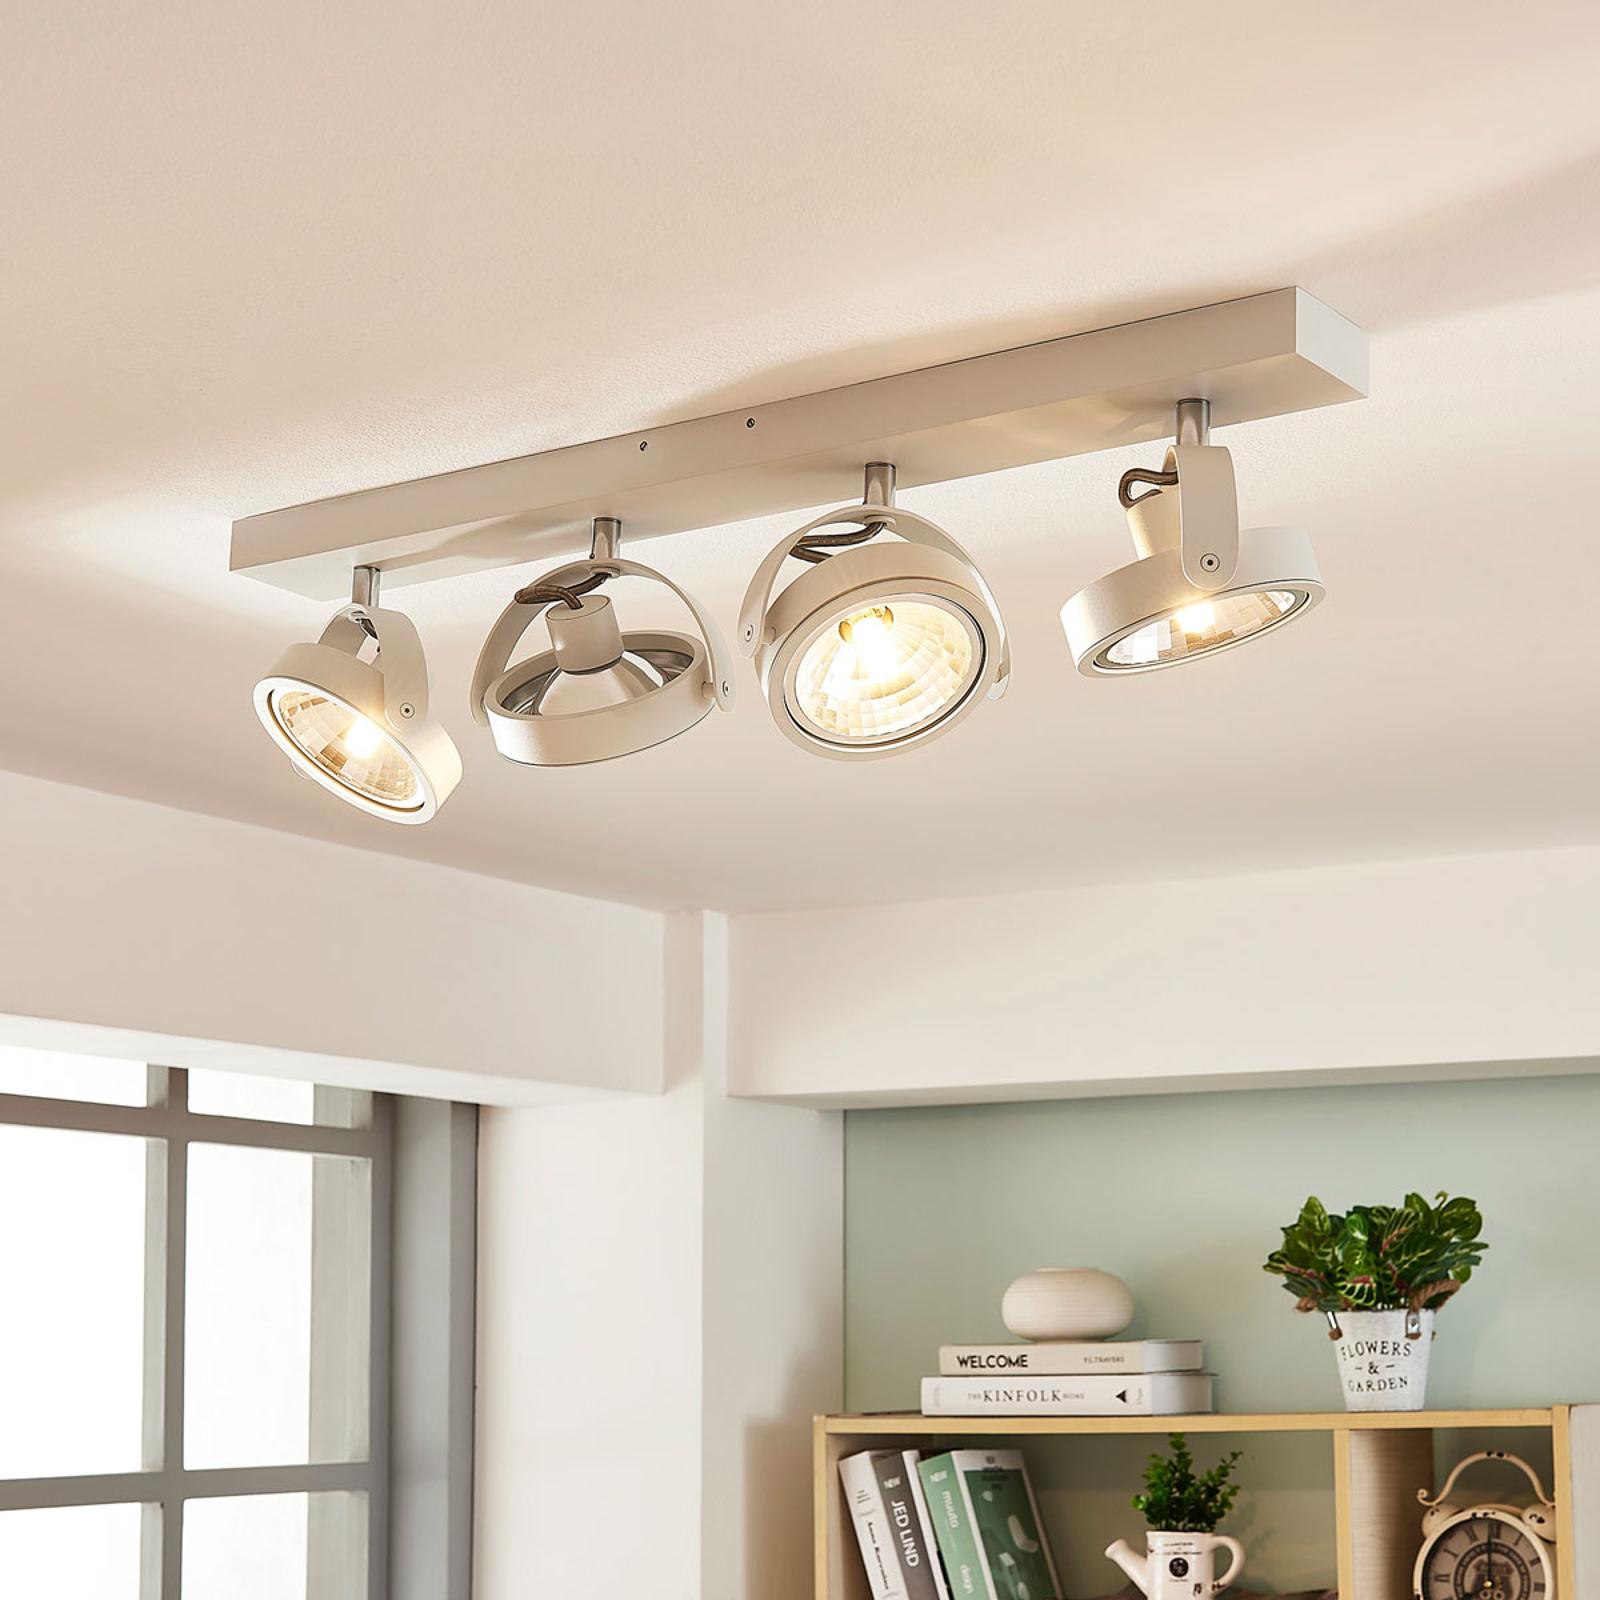 Avlang, hvit LED-taklampe Lieven, 4 lys